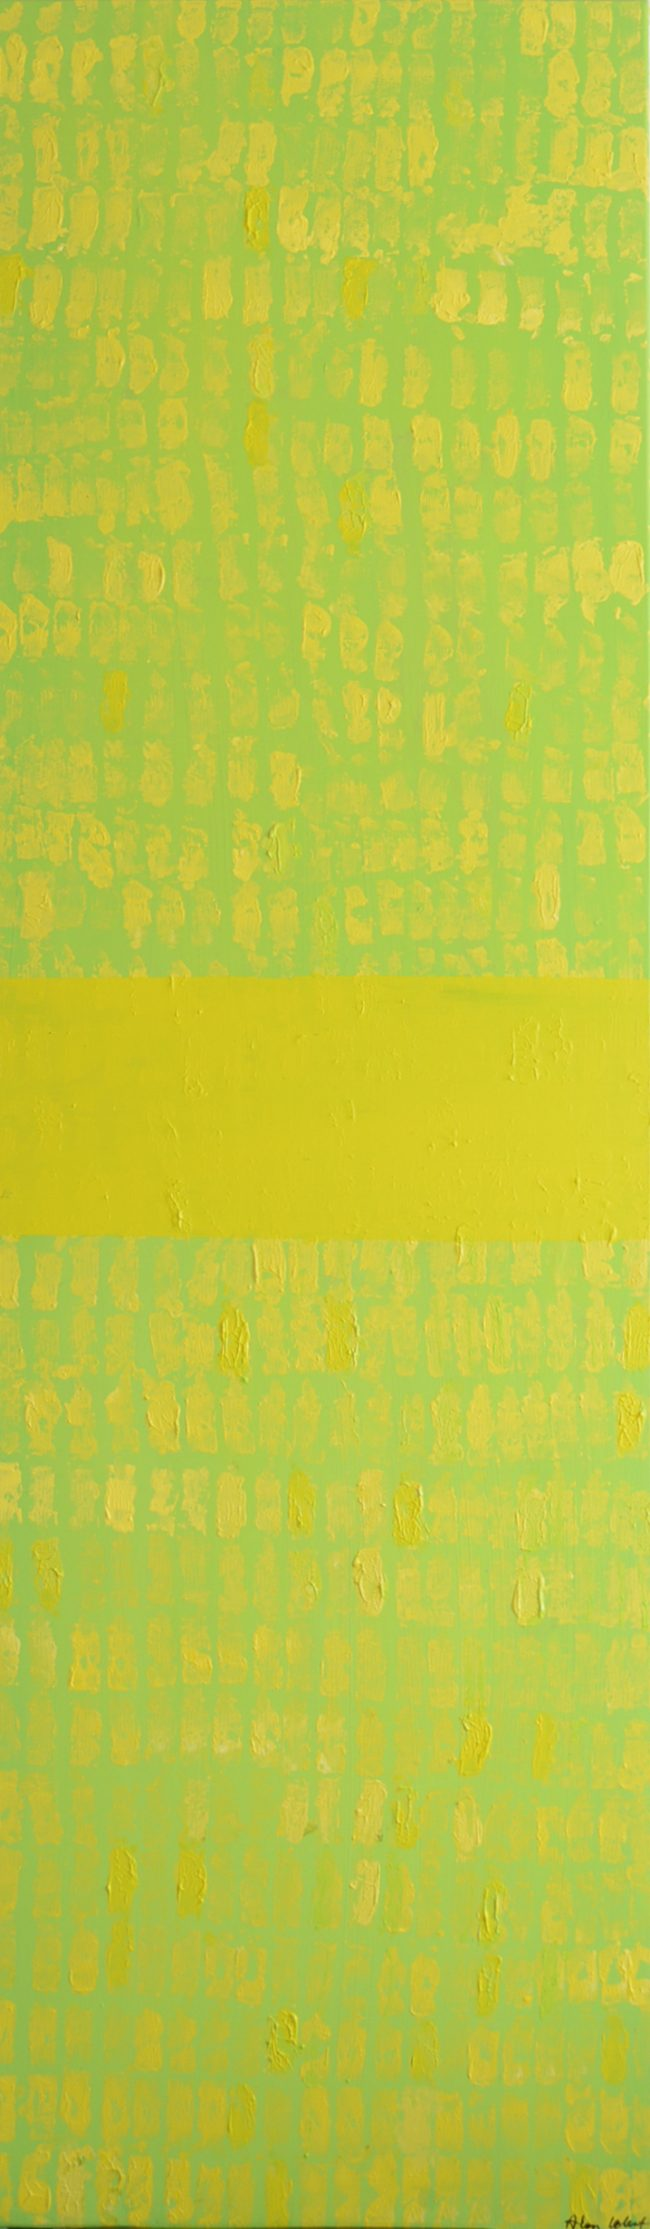 Alan Velvet, European Visual Artist, Bamboo part one, 2015-2016 - Acryl on canvas - 60x200cm